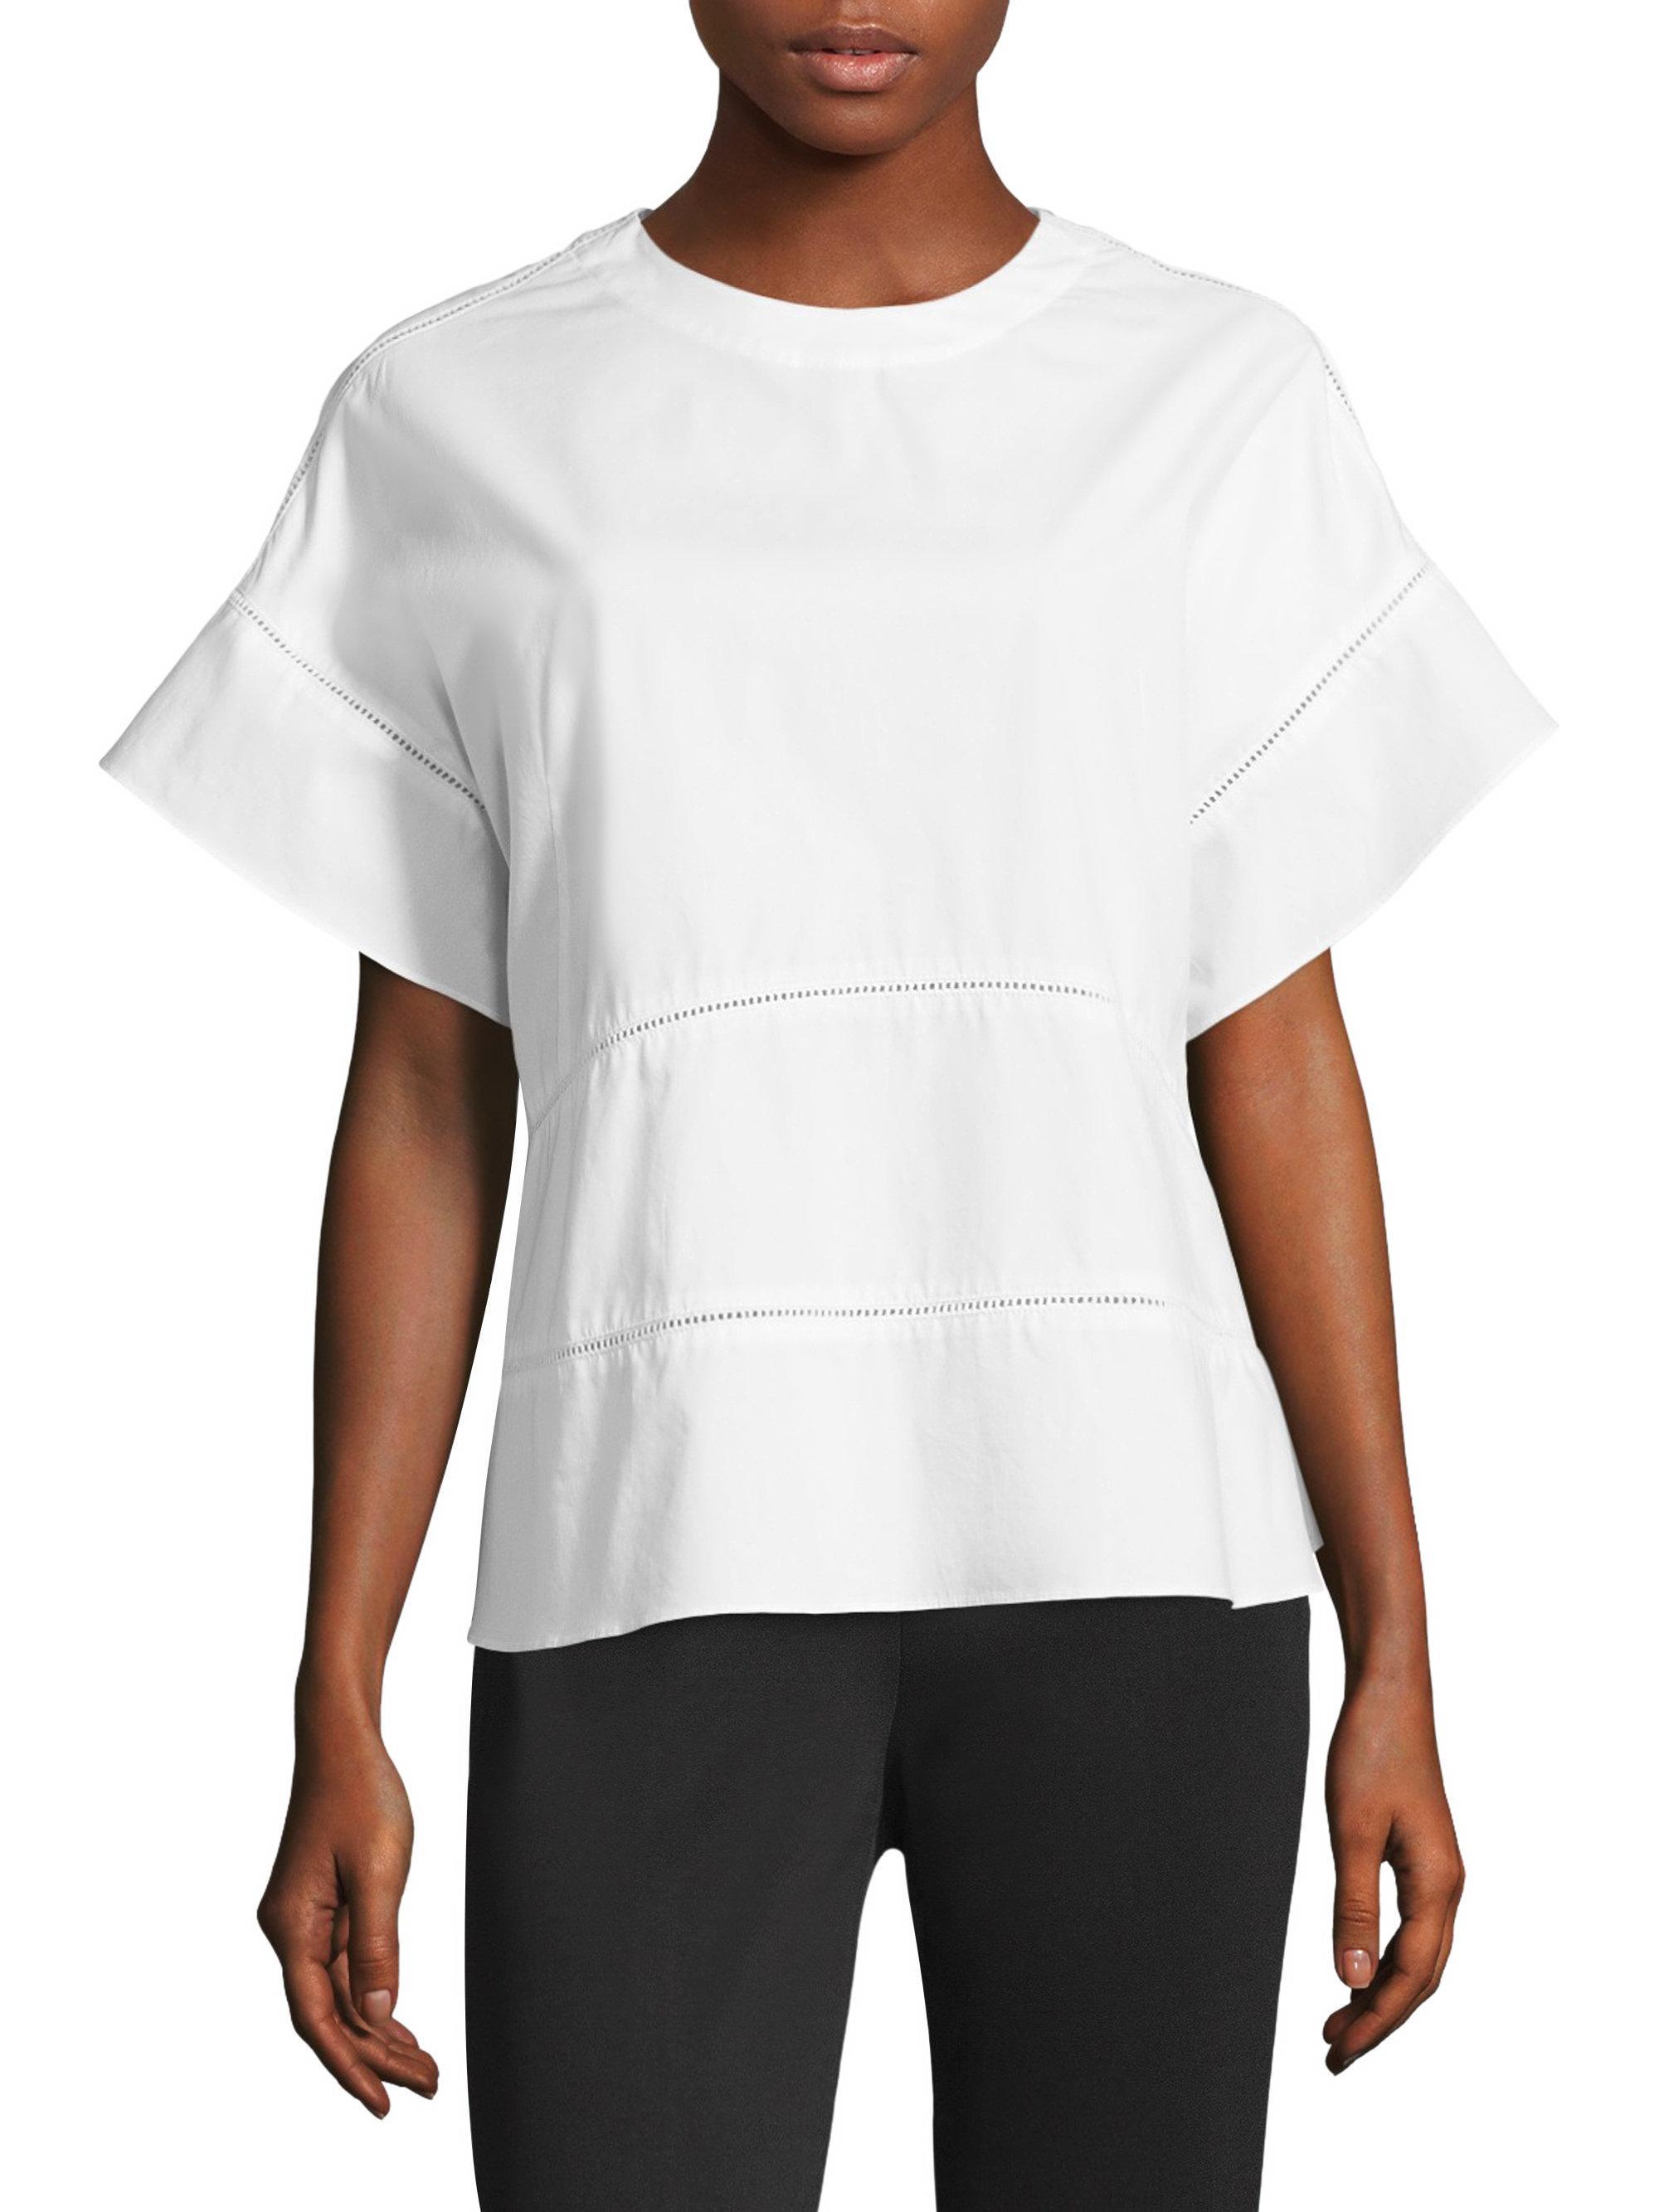 Donna Karan TOPS - T-shirts snxkThz